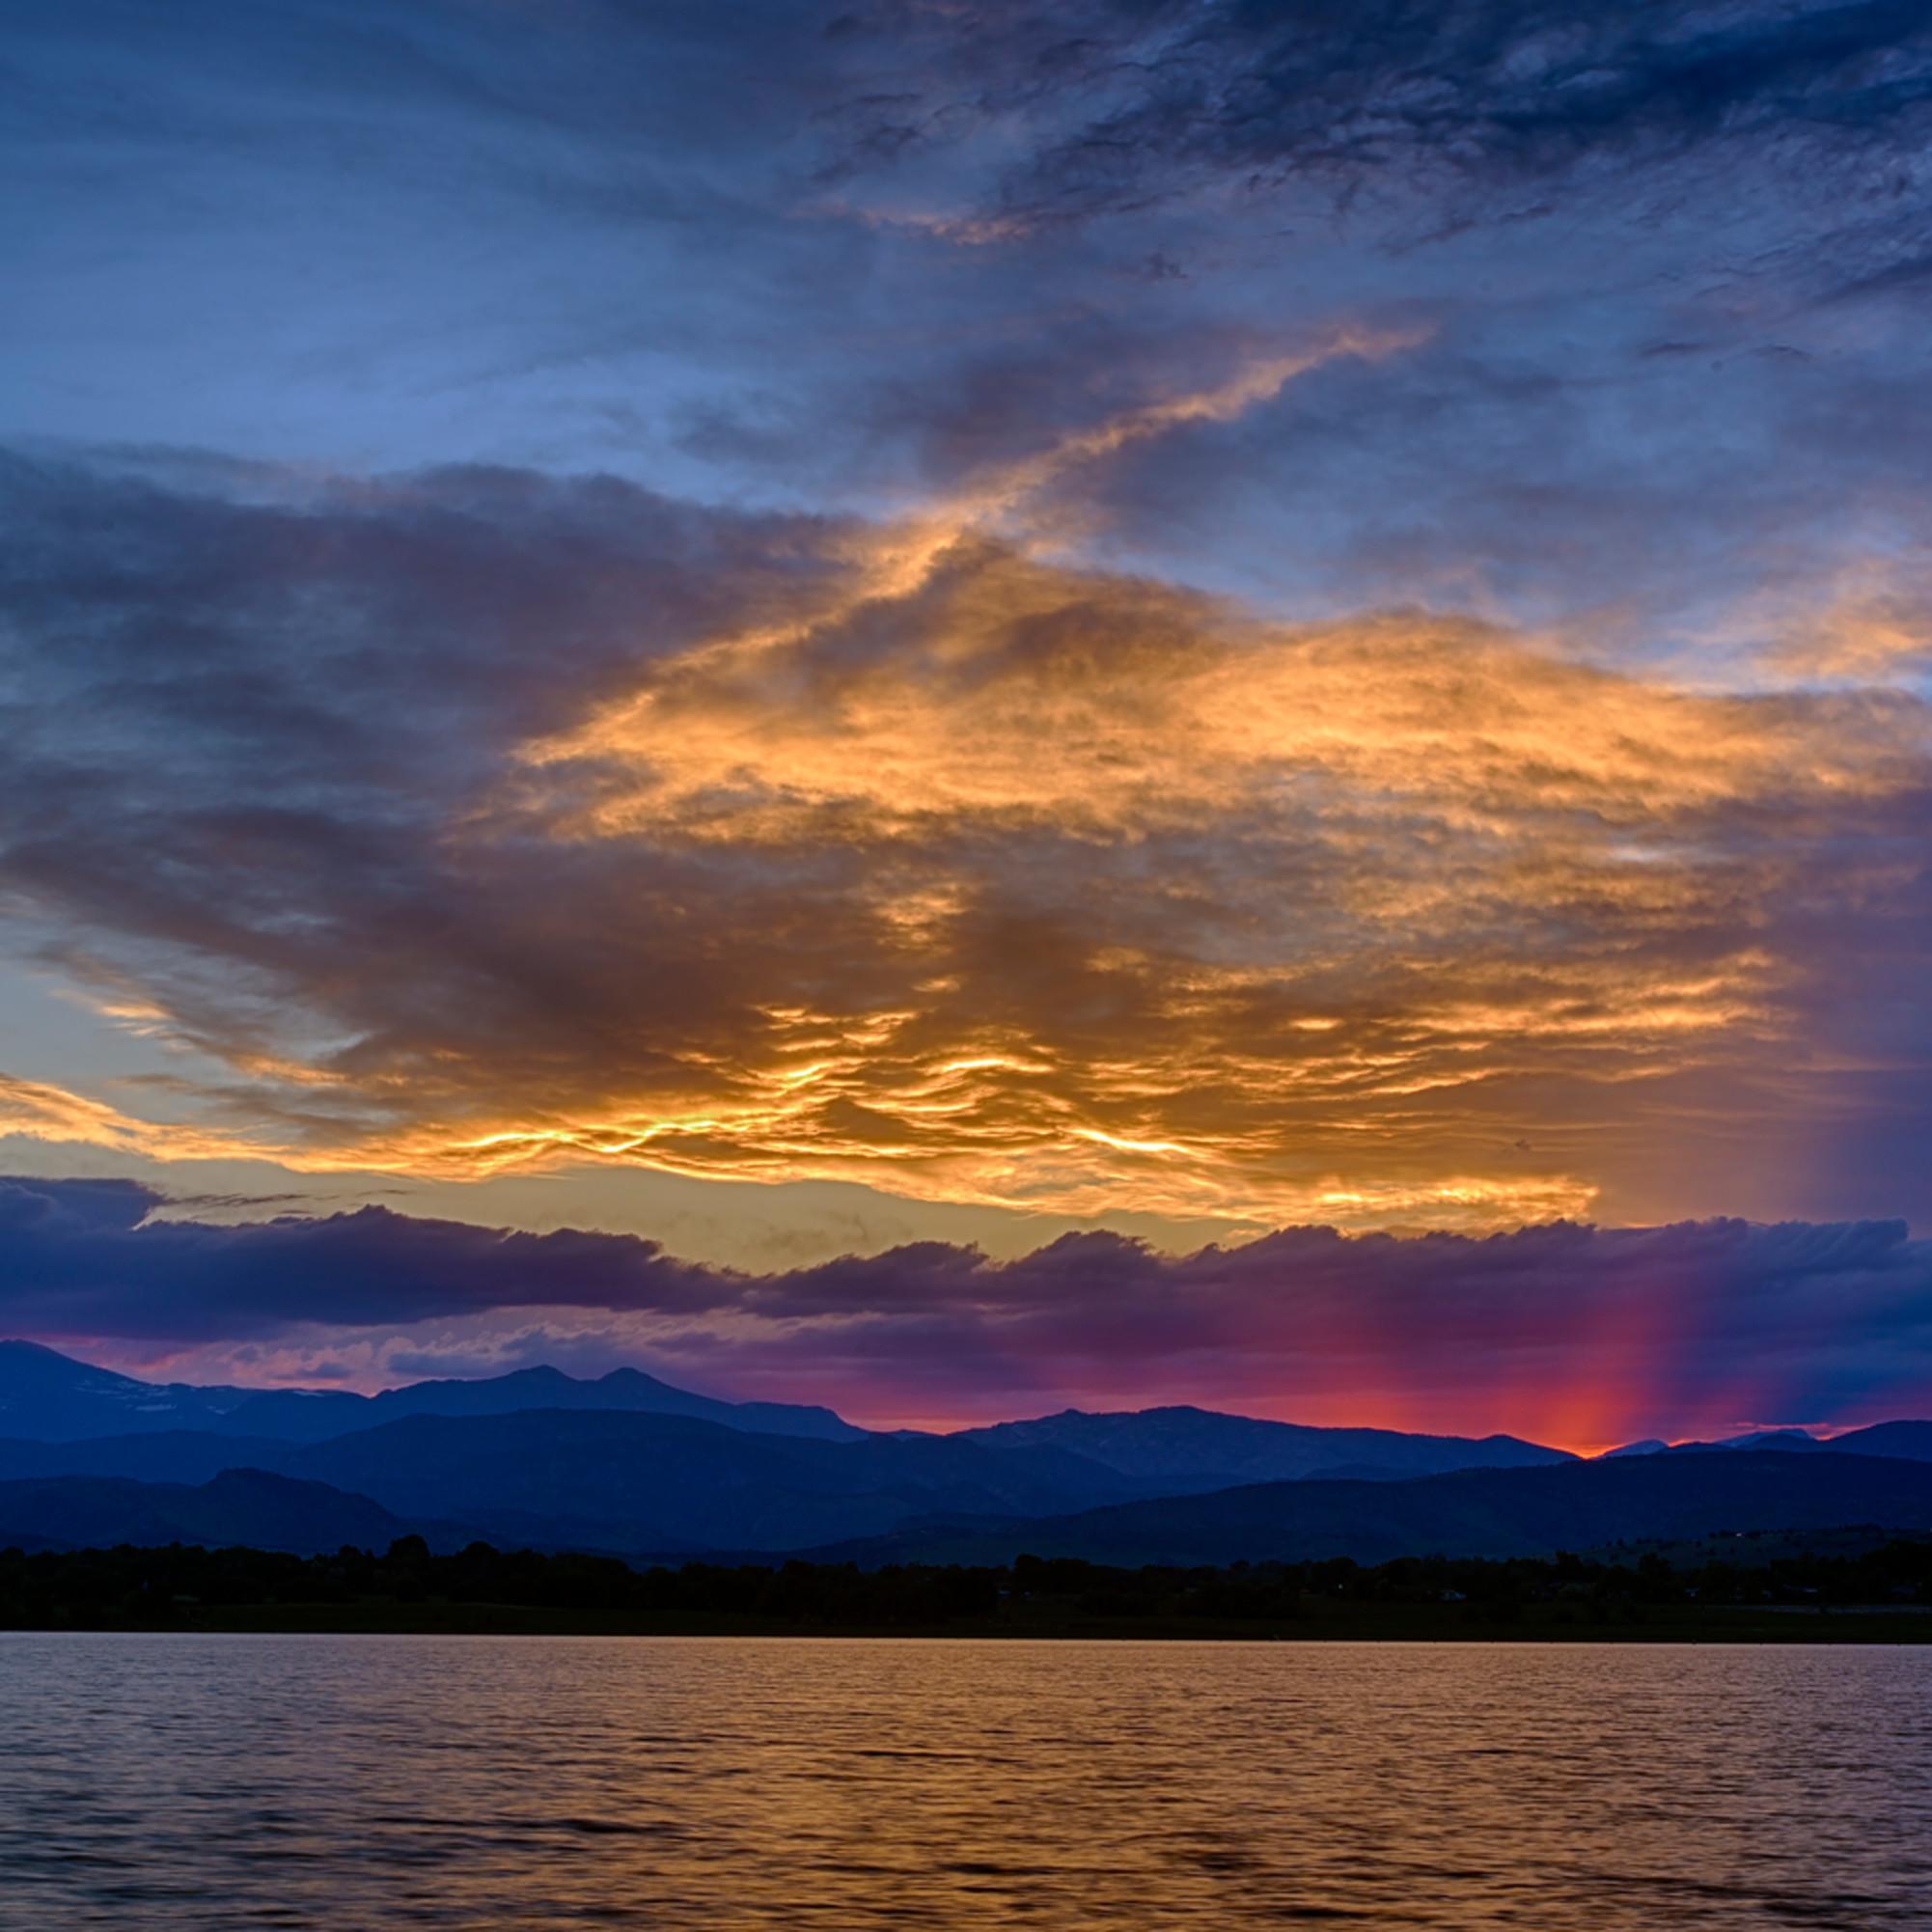 Mountain sunset at mcintosh lake hzmafg